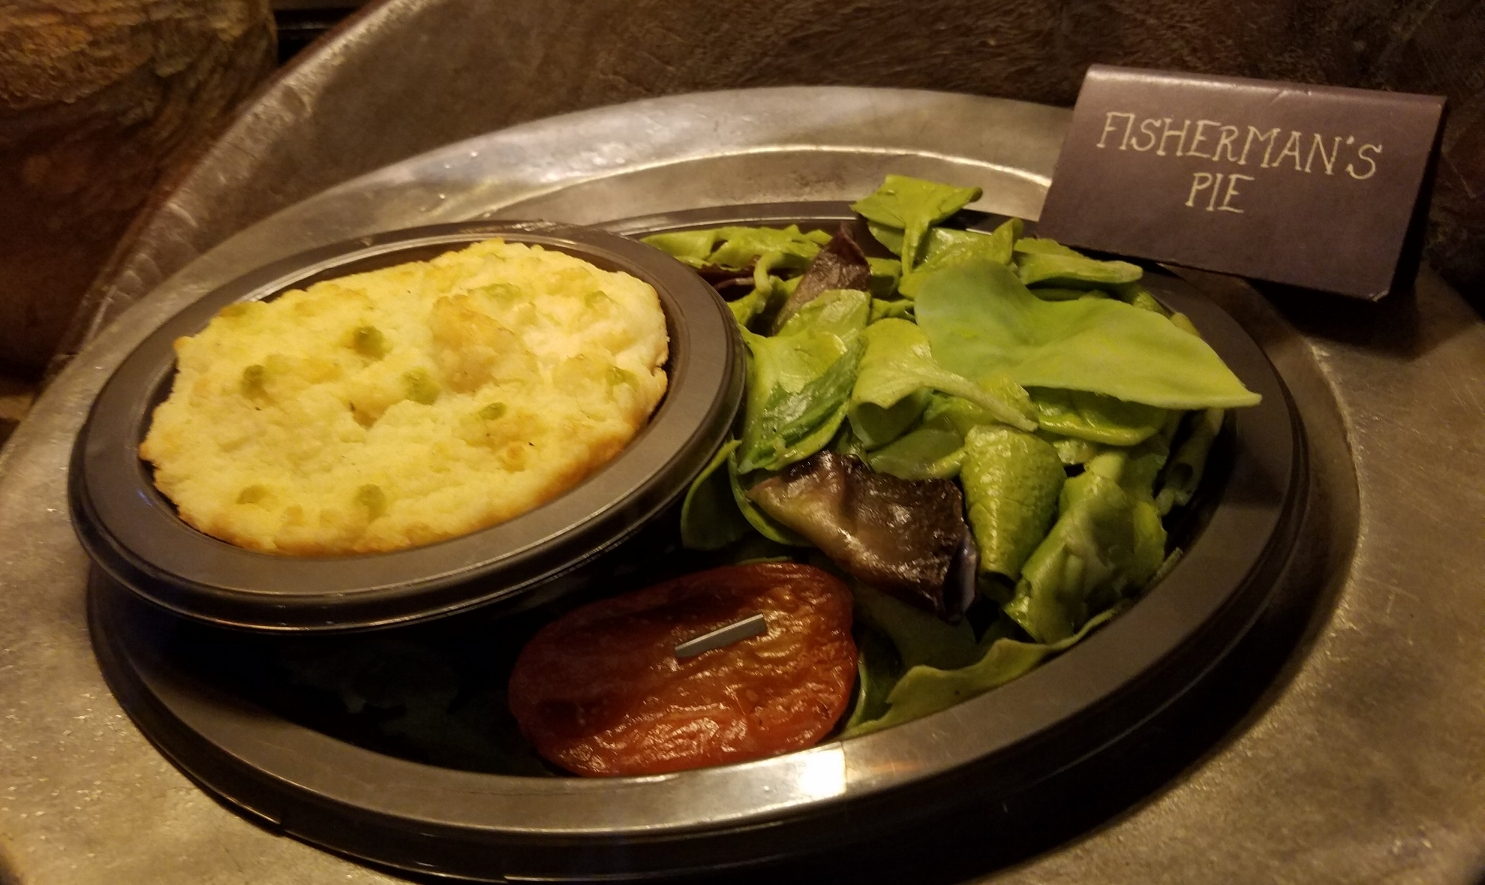 Fisherman's Pie at Leaky Cauldron